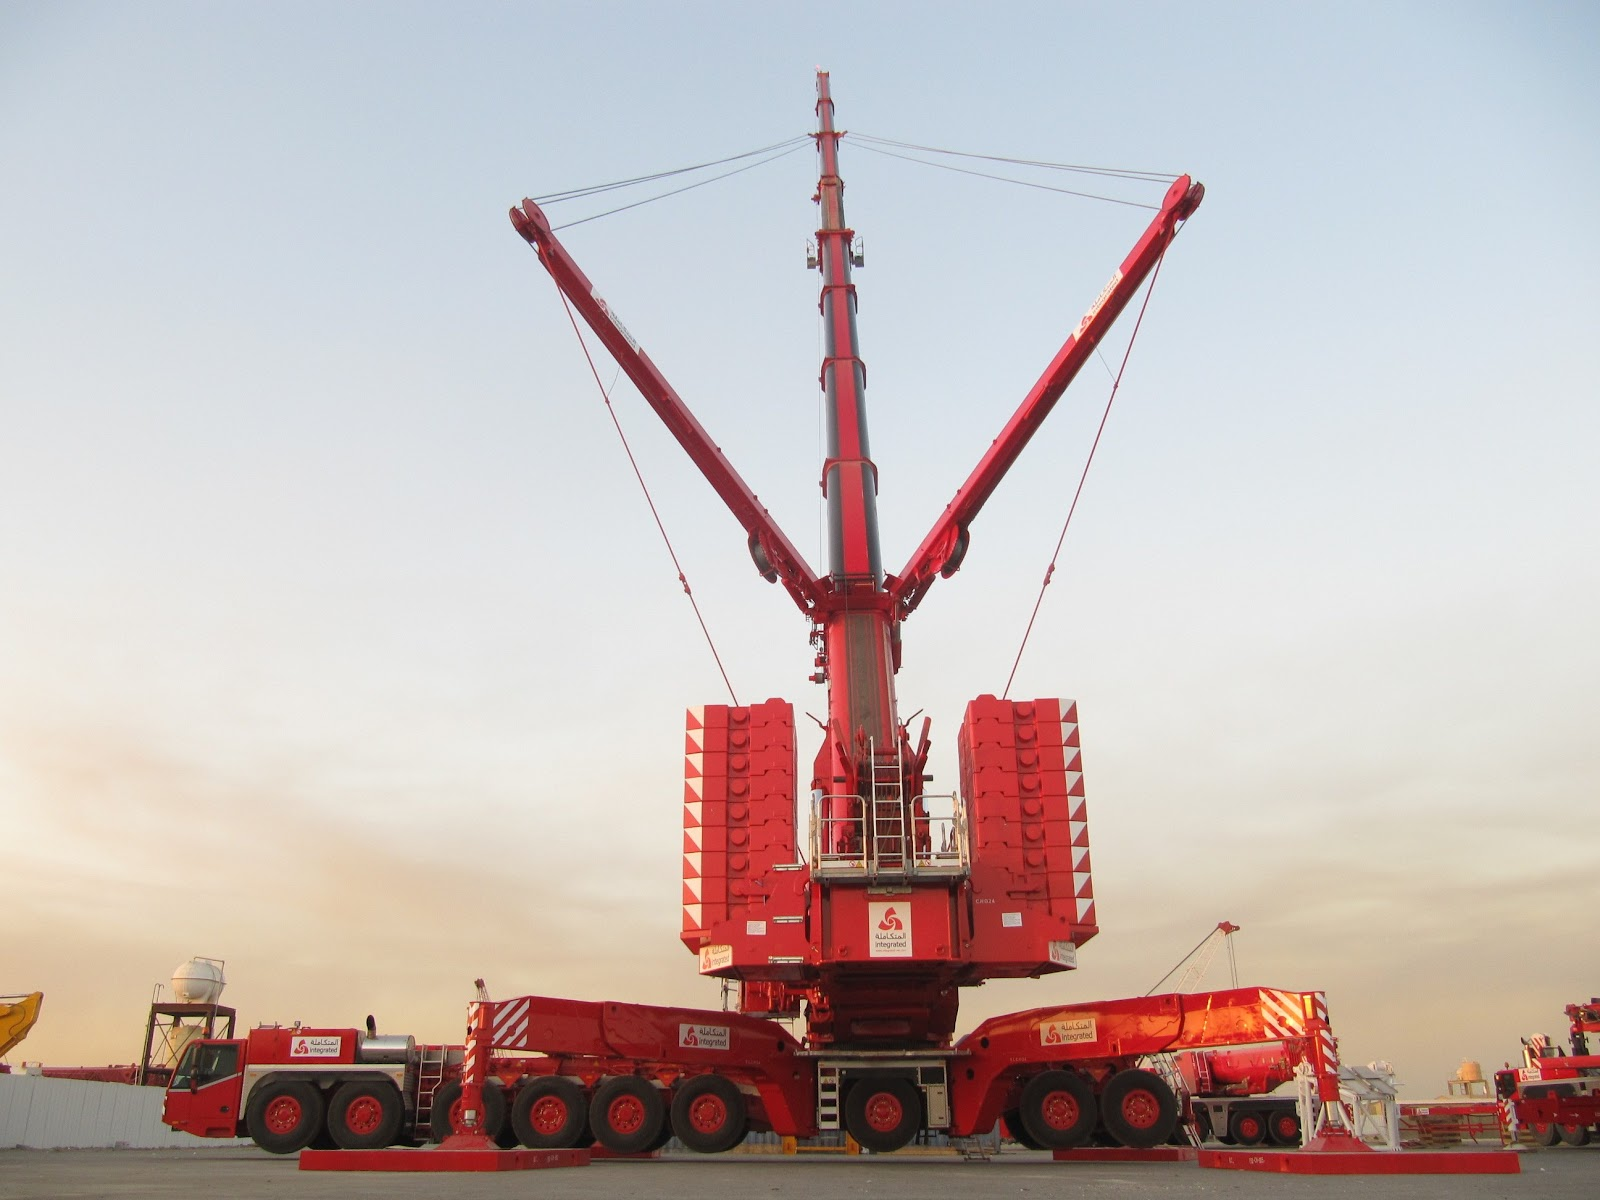 Mobile Crane Construction Truck Semi Tractor Ariel Cranes Boom Wallpaper 2592x1944 600427 Total Update